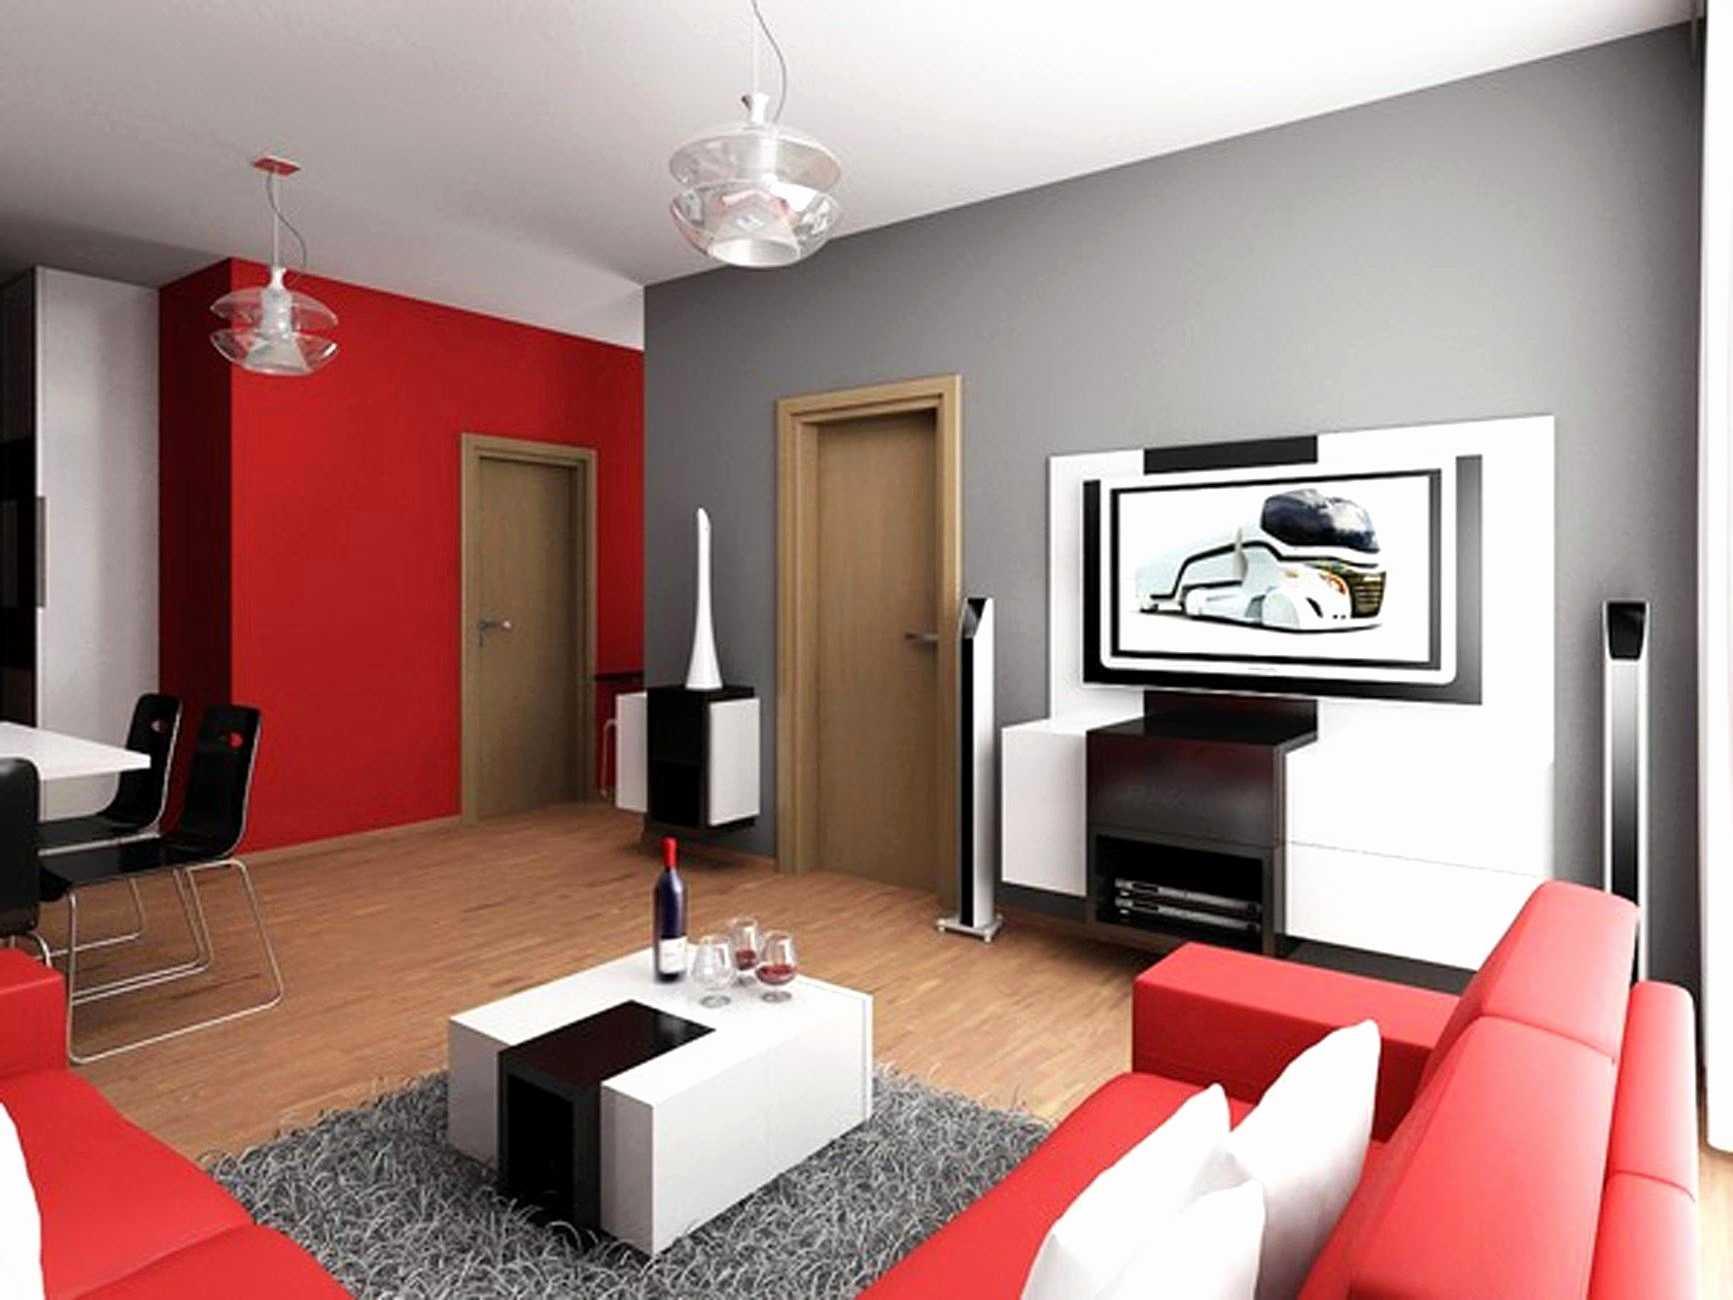 Minimalistisk röd sektions soffa vardagsrum stil